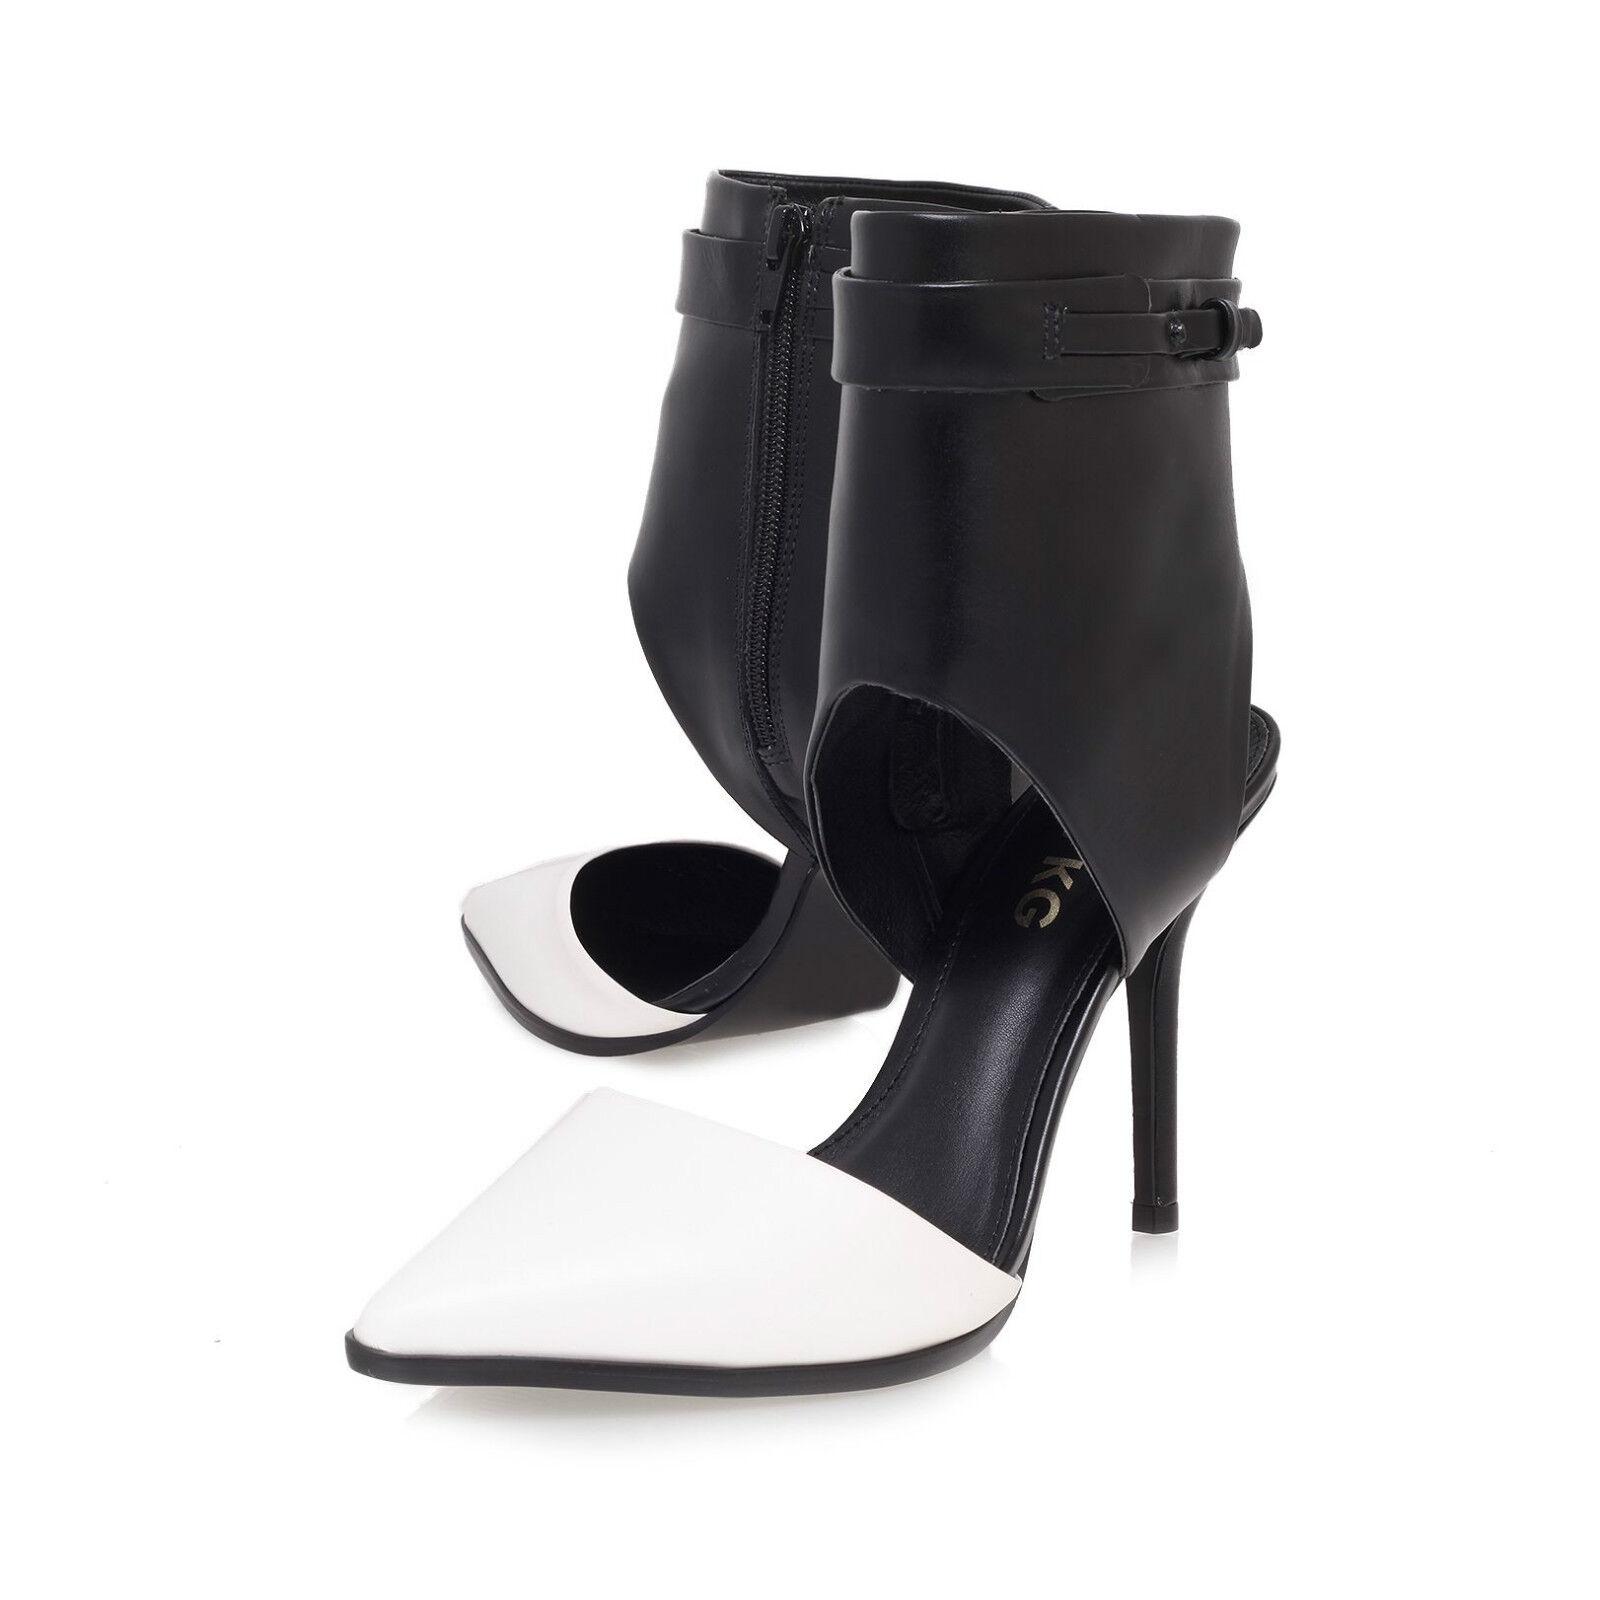 MISS KG Stiefel / BLACK & Weiß LEATHER / STILETTO Schuhe / UK  5  EU 38